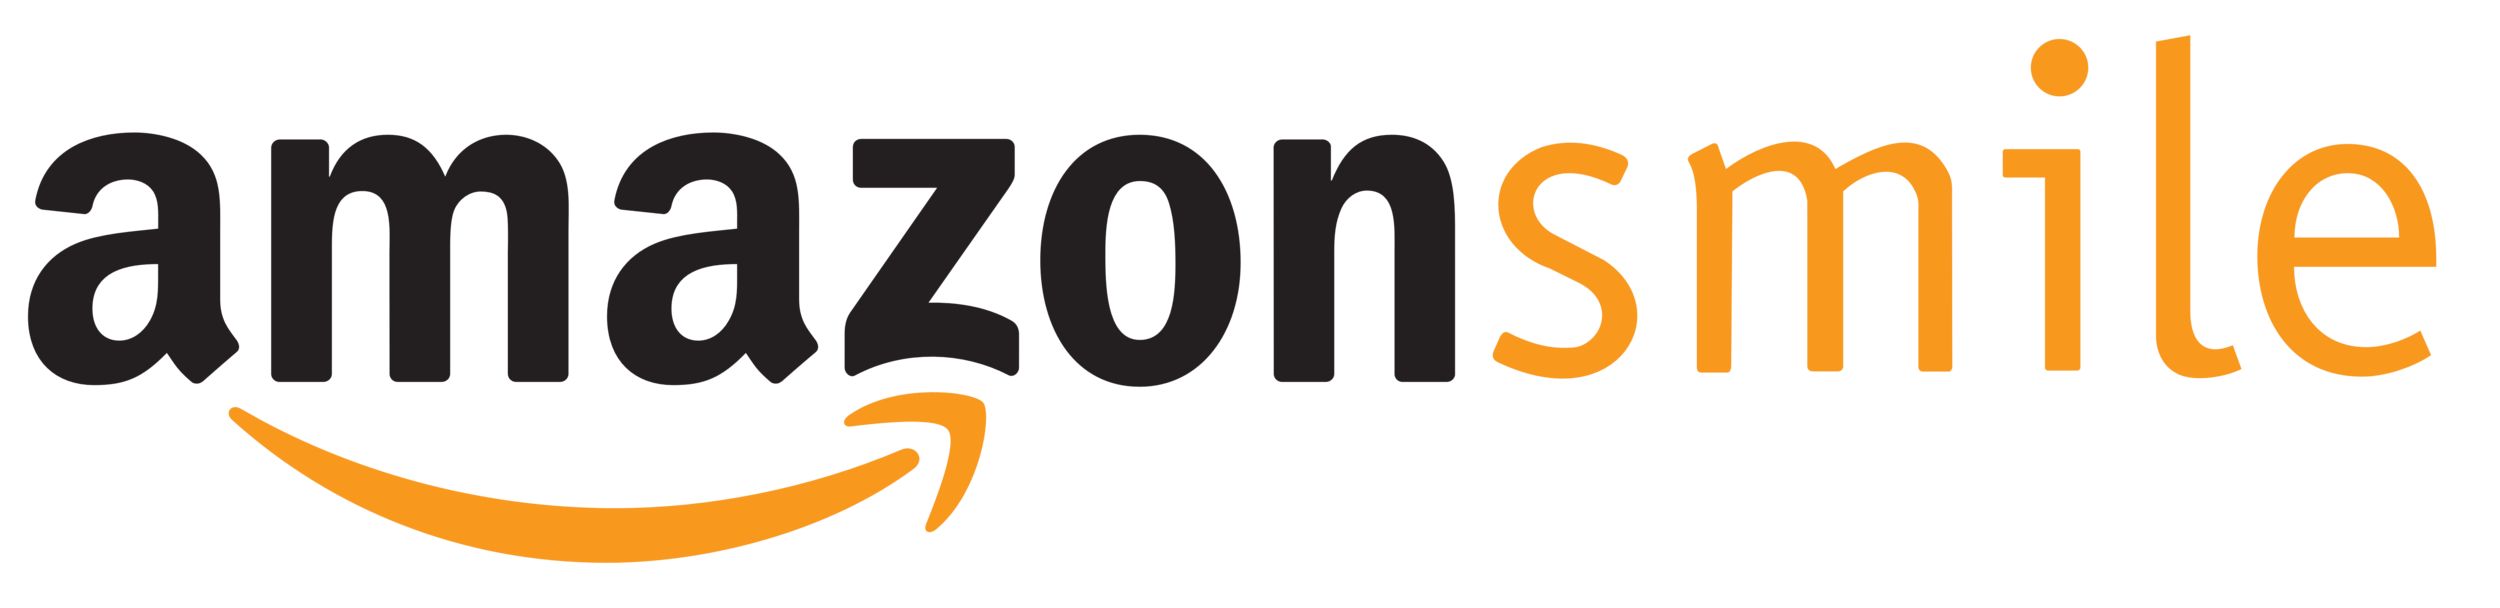 Amazon_Smile_logo-1.png